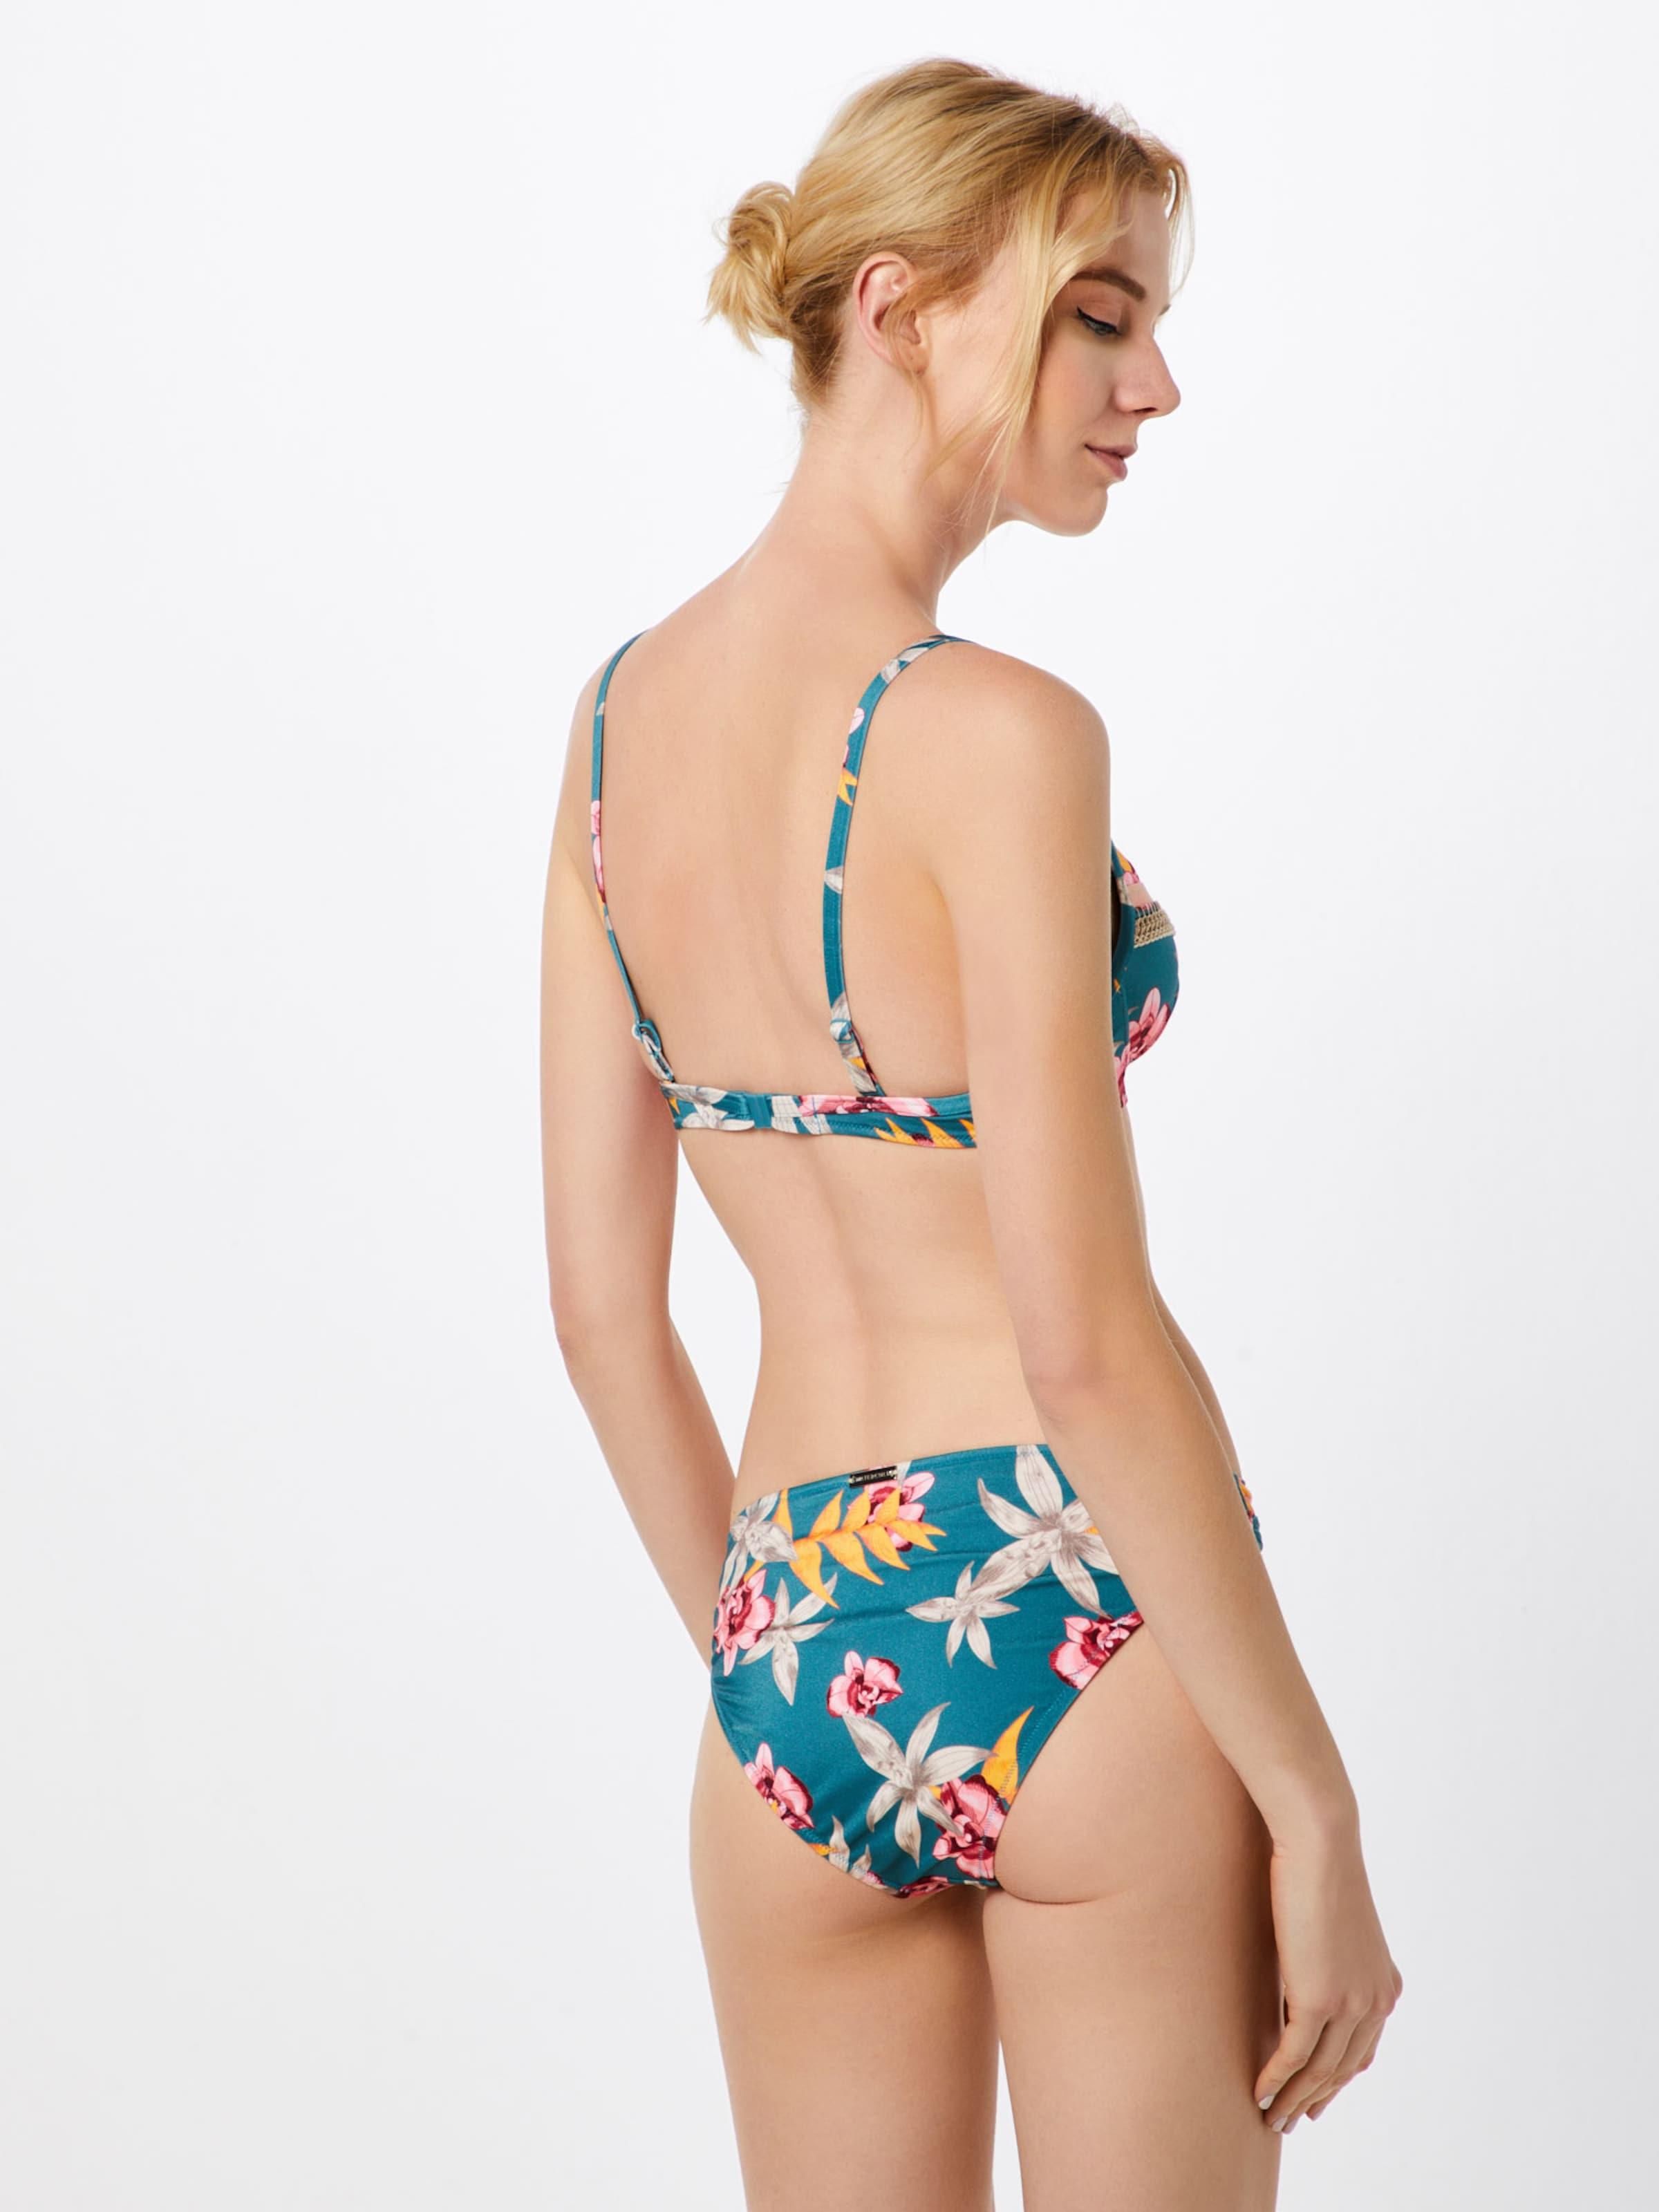 Rosa Watercult Rosa BlauwGoudgeel BlauwGoudgeel Bikinitop In Watercult Bikinitop Bikinitop Watercult In 8wOvmnN0